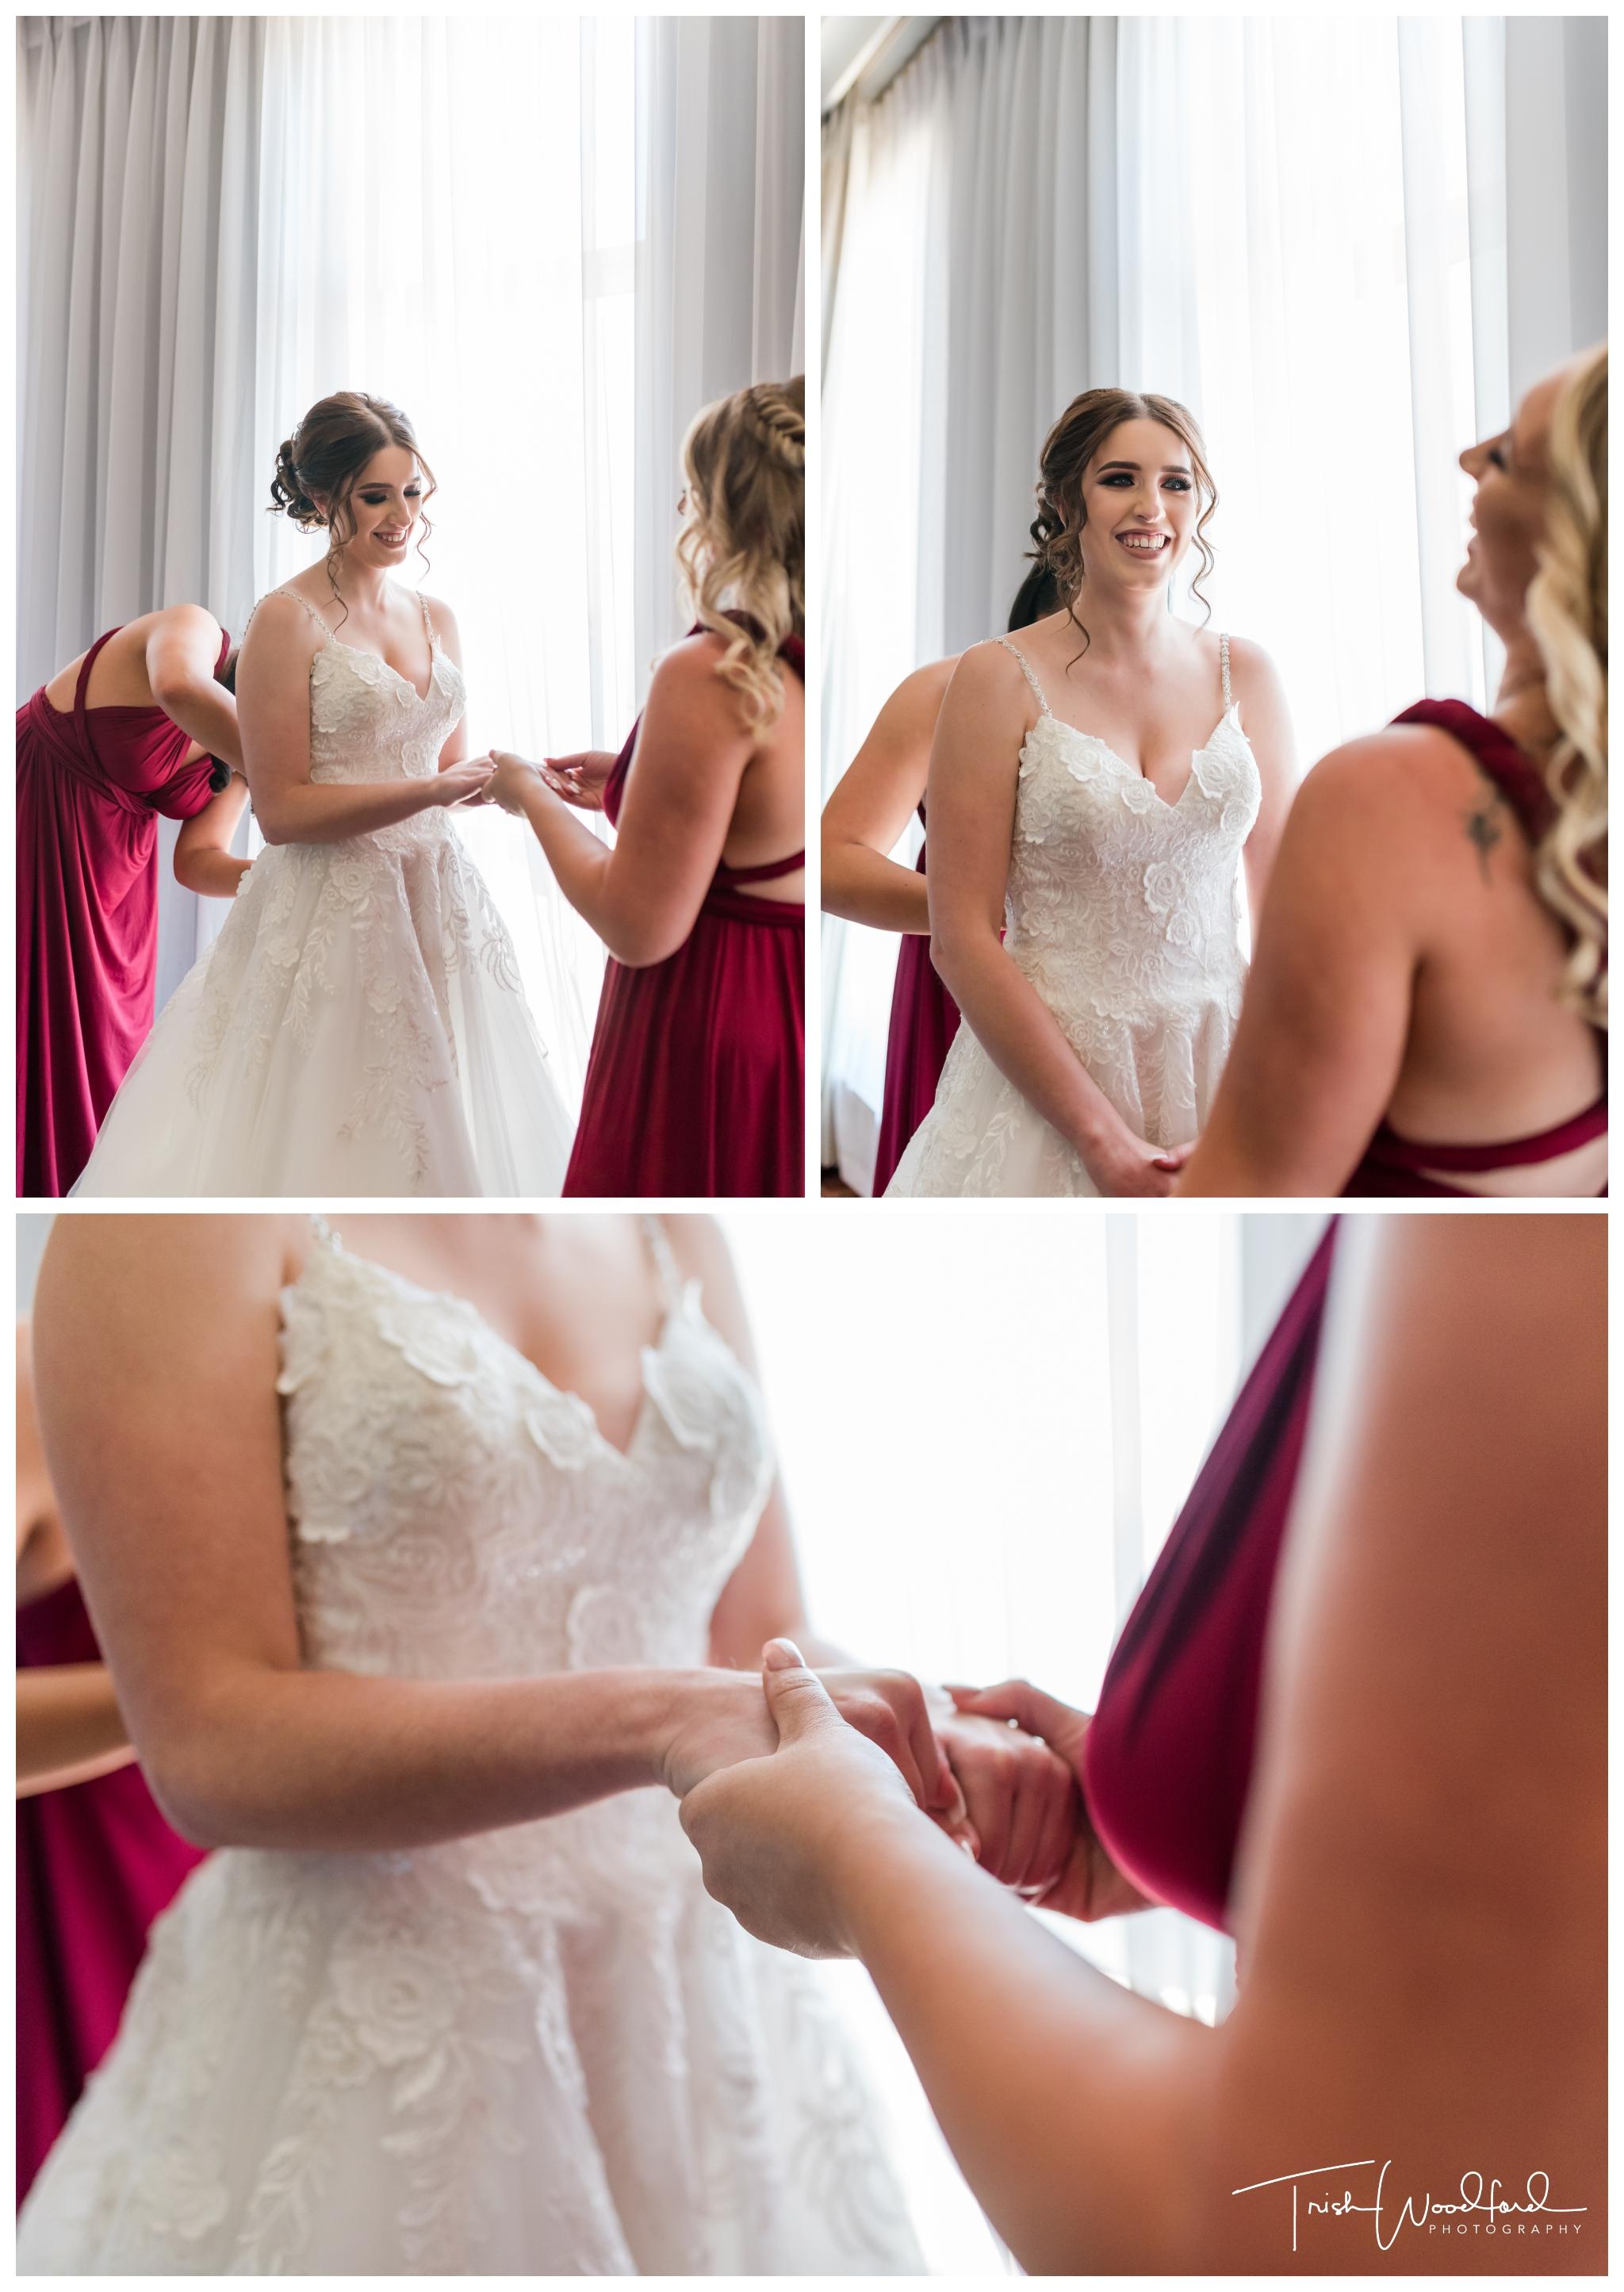 Bride-Duxton-Hotel-Wedding